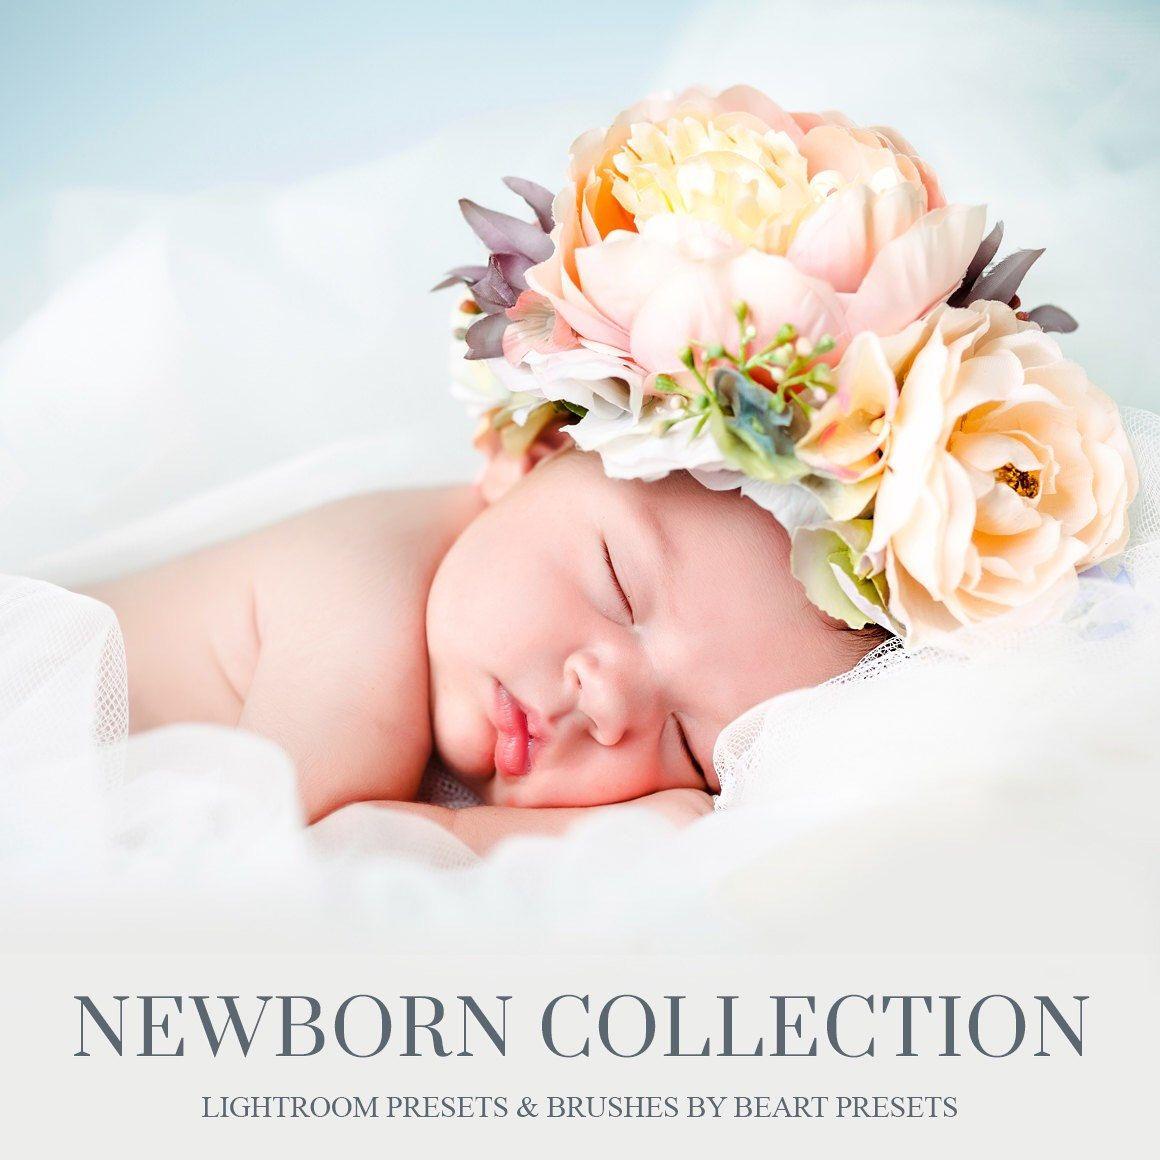 32499cd855b84 Newborn Pictures · Baby Photos · June 2016 UPDATE: +15 Lightroom brushes  were added! Now you get 15 Lightroom